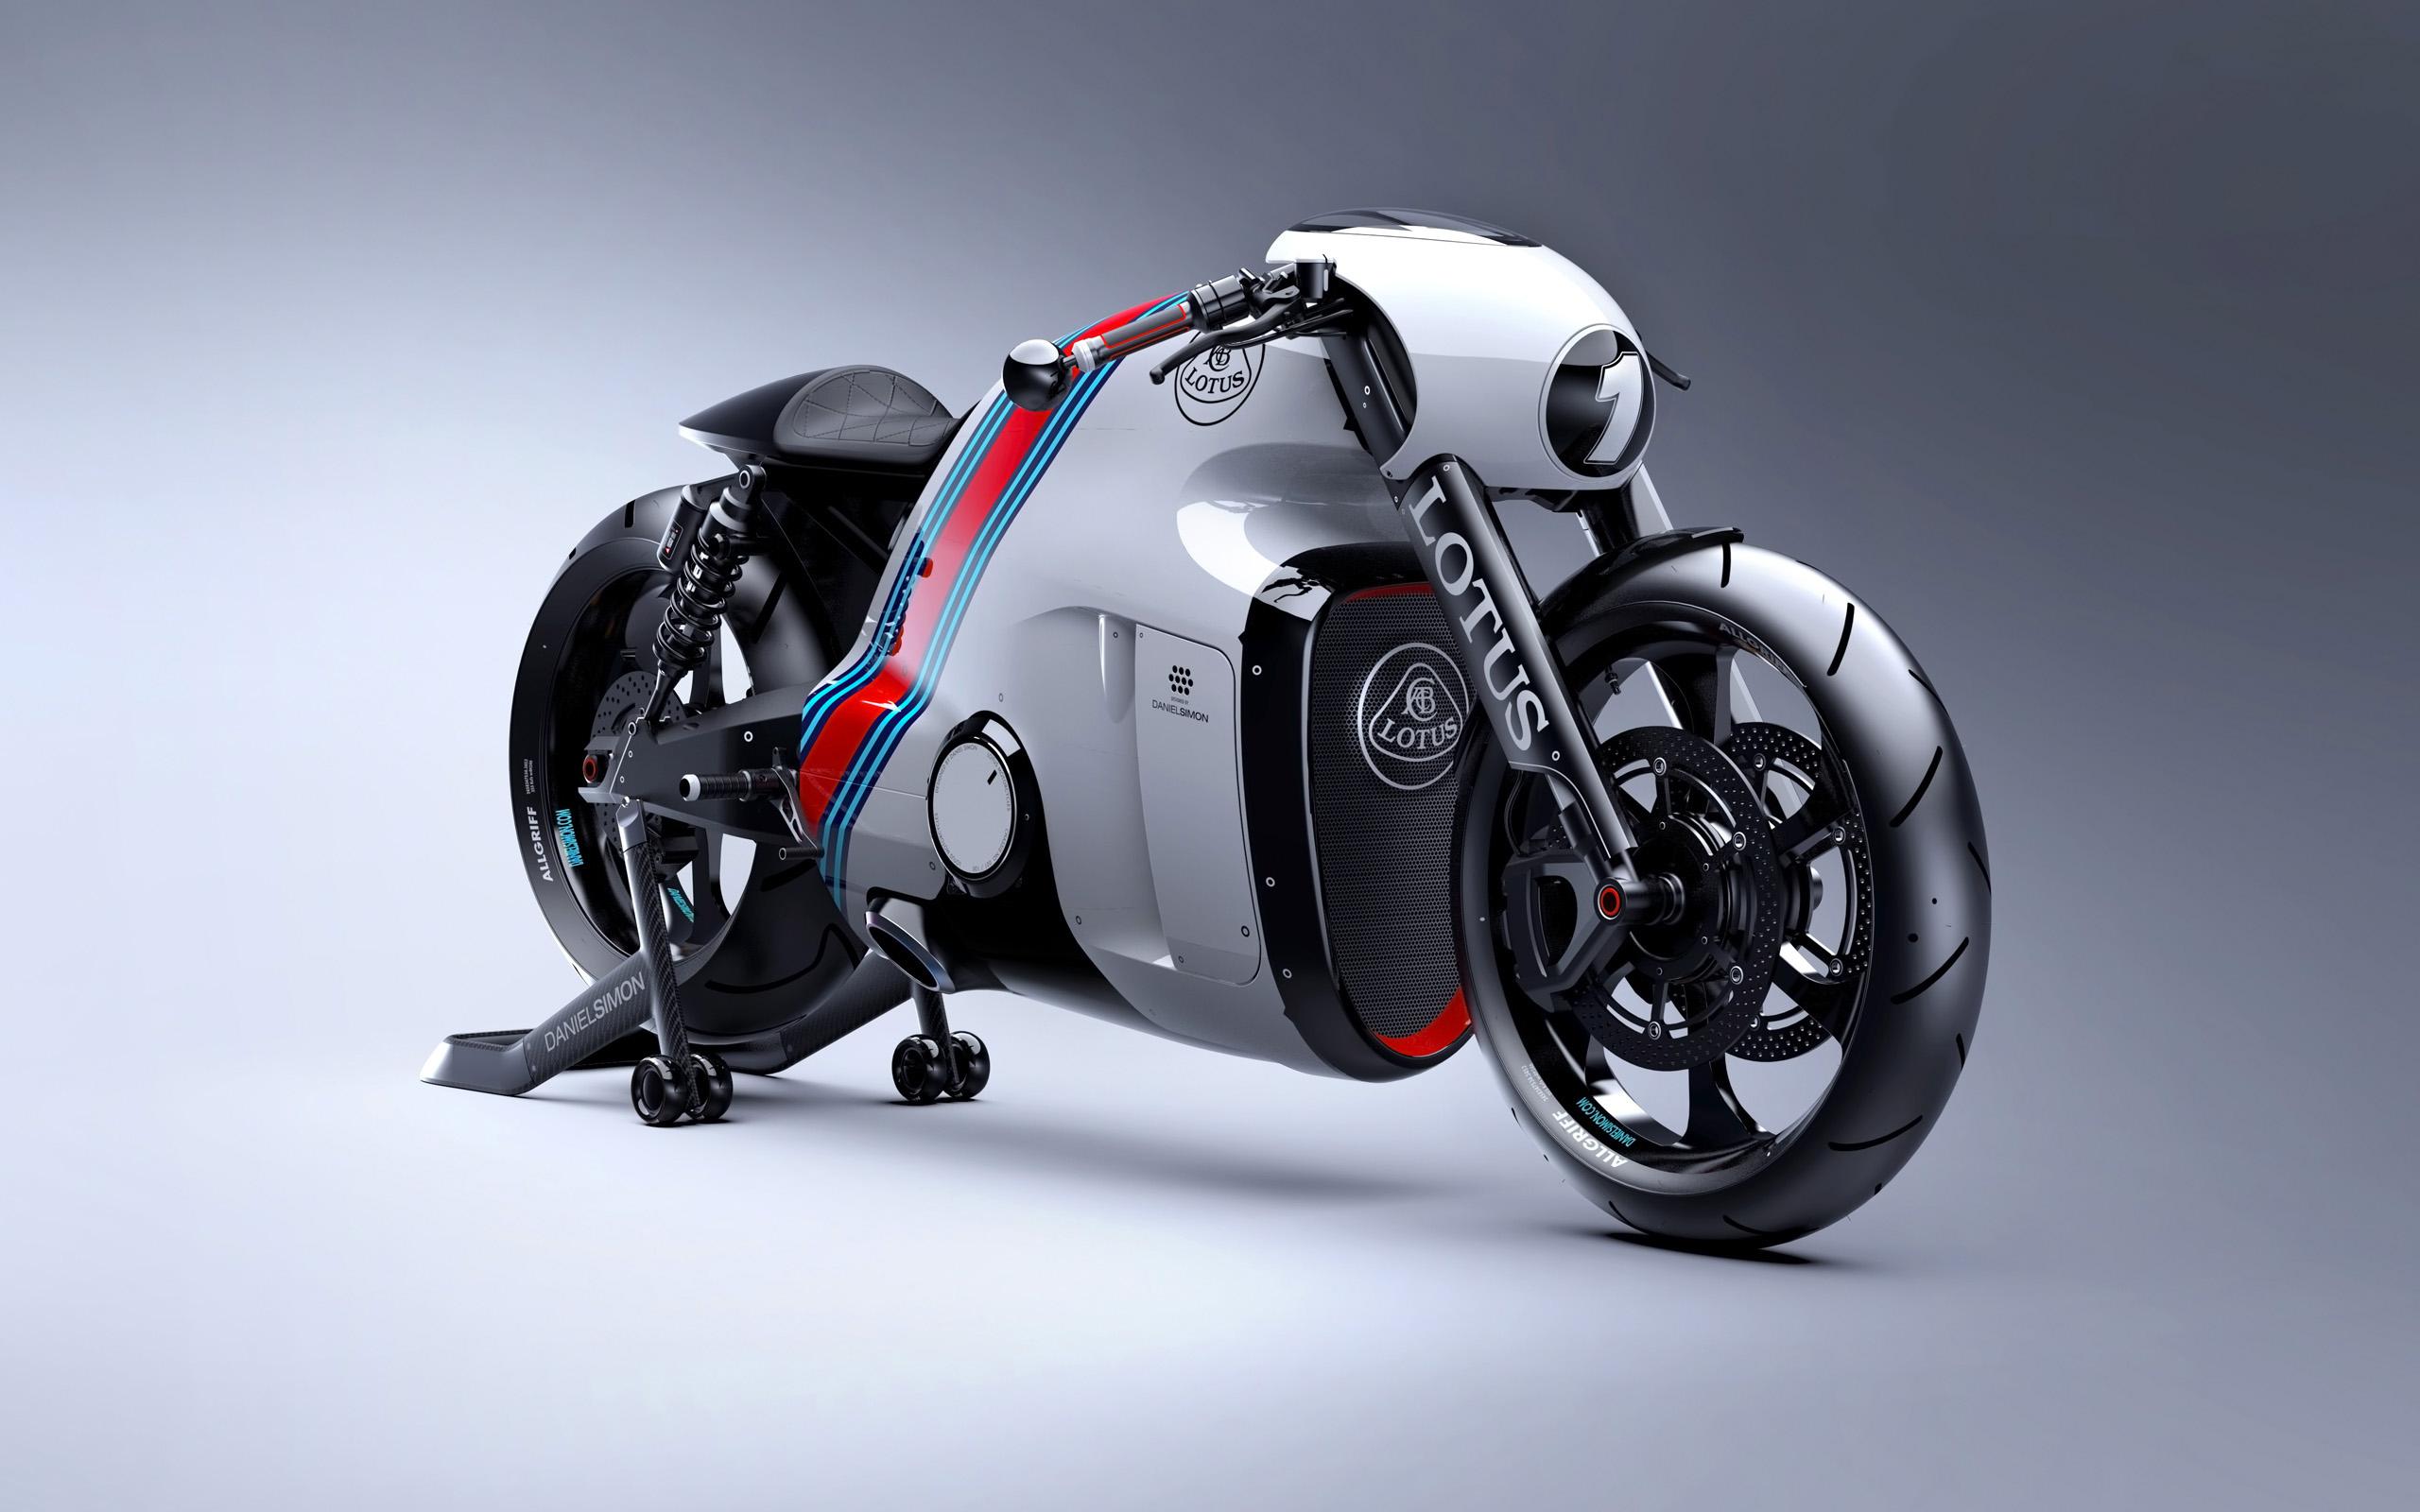 2014 Lotus Motorcycles C 01 Wallpapers HD Wallpapers 2560x1600